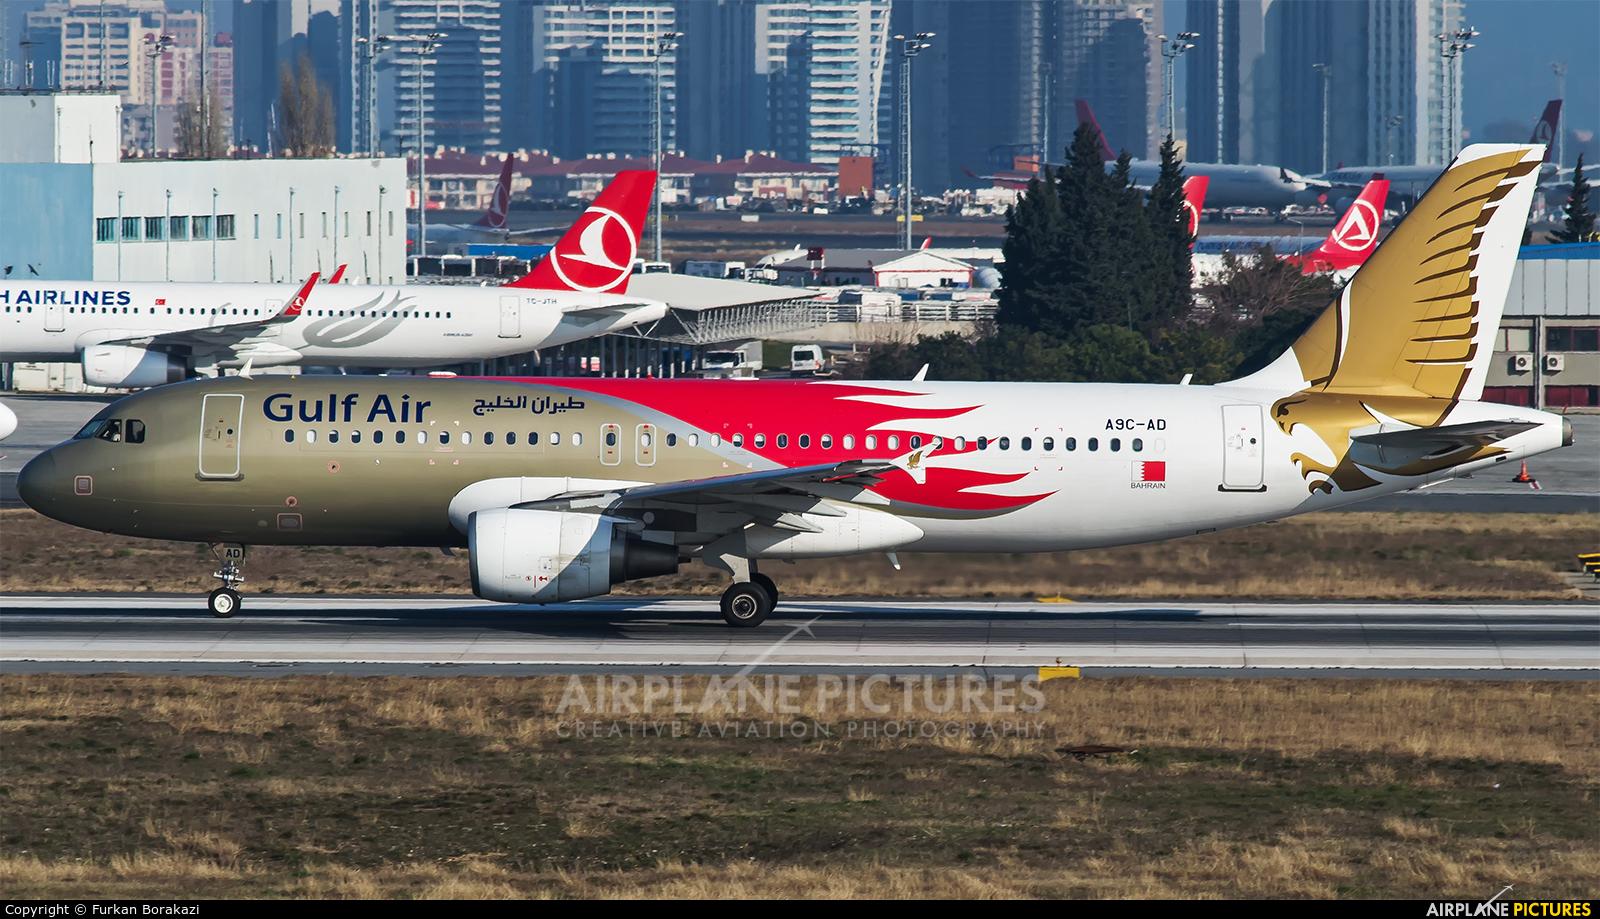 Gulf Air A9C-AD aircraft at Istanbul - Ataturk